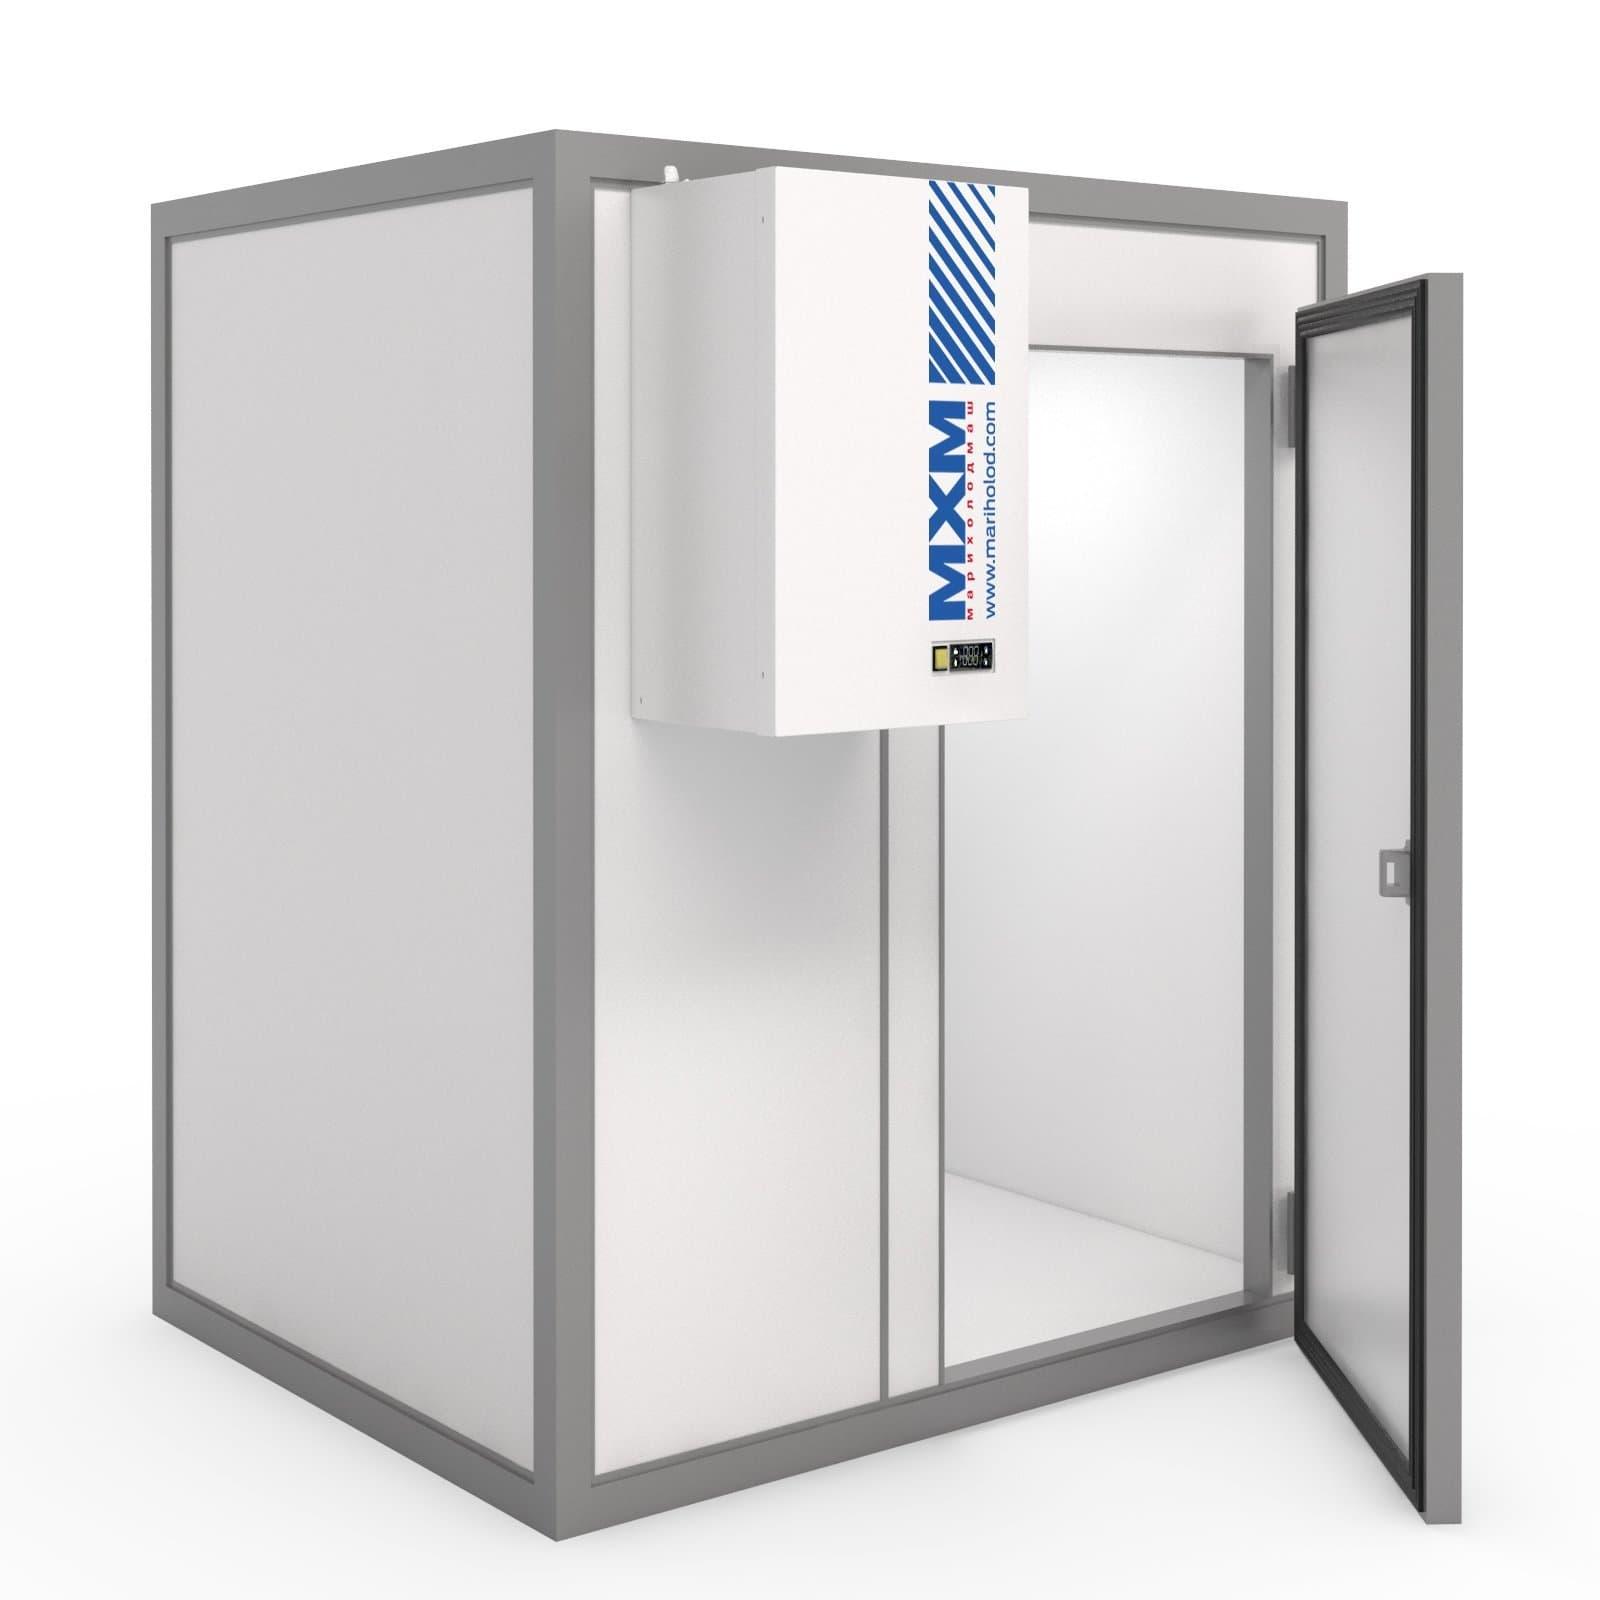 Камера холодильная МХМ КХН-39,66 1360×16360×2200